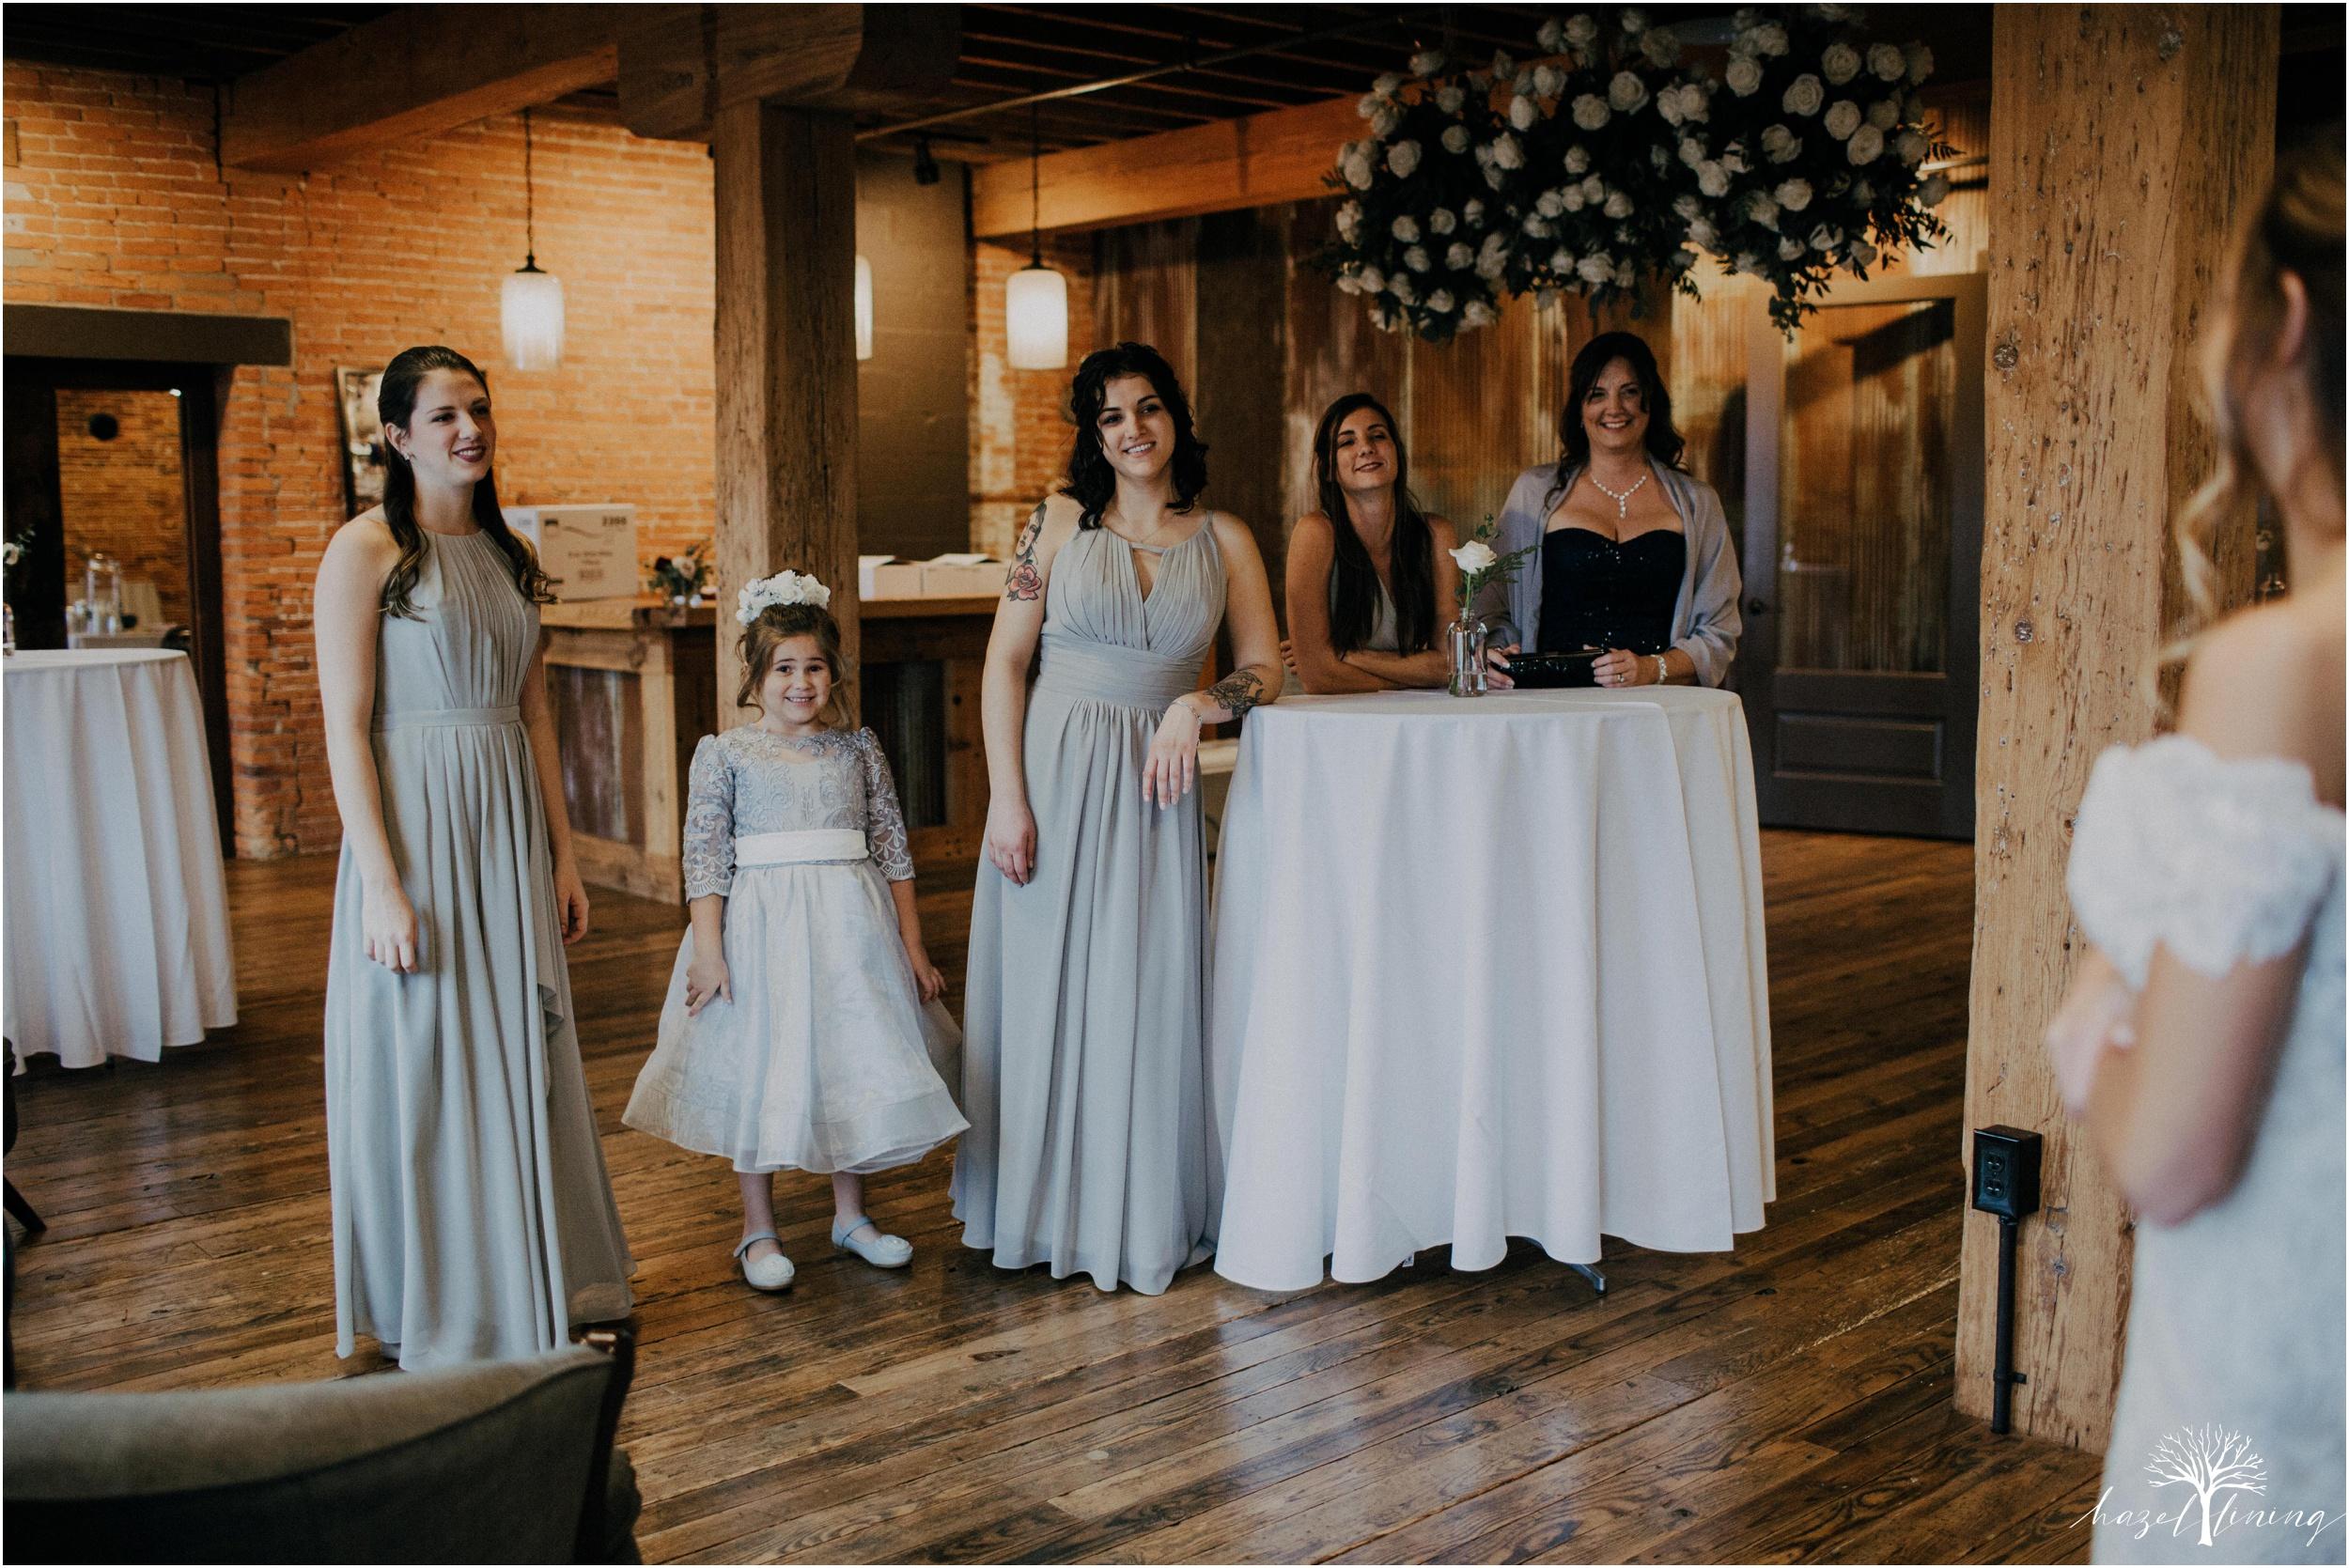 emma-matt-gehringer-the-booking-house-lancaster-manhiem-pennsylvania-winter-wedding_0010.jpg